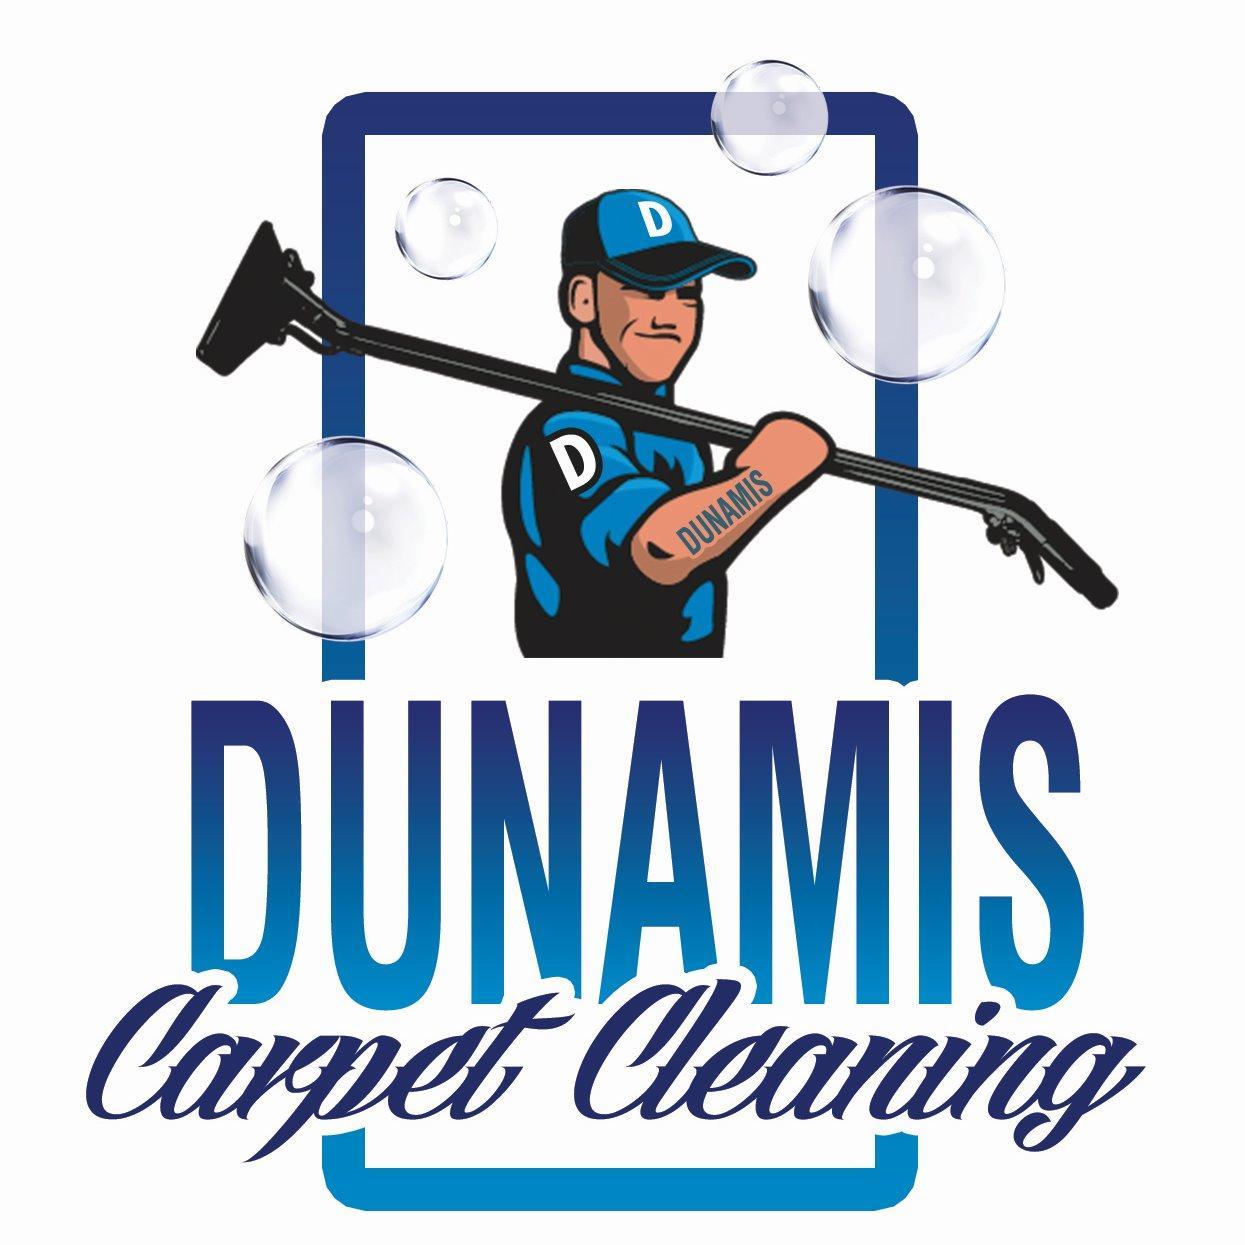 Dunamis Carpet Cleaning image 1